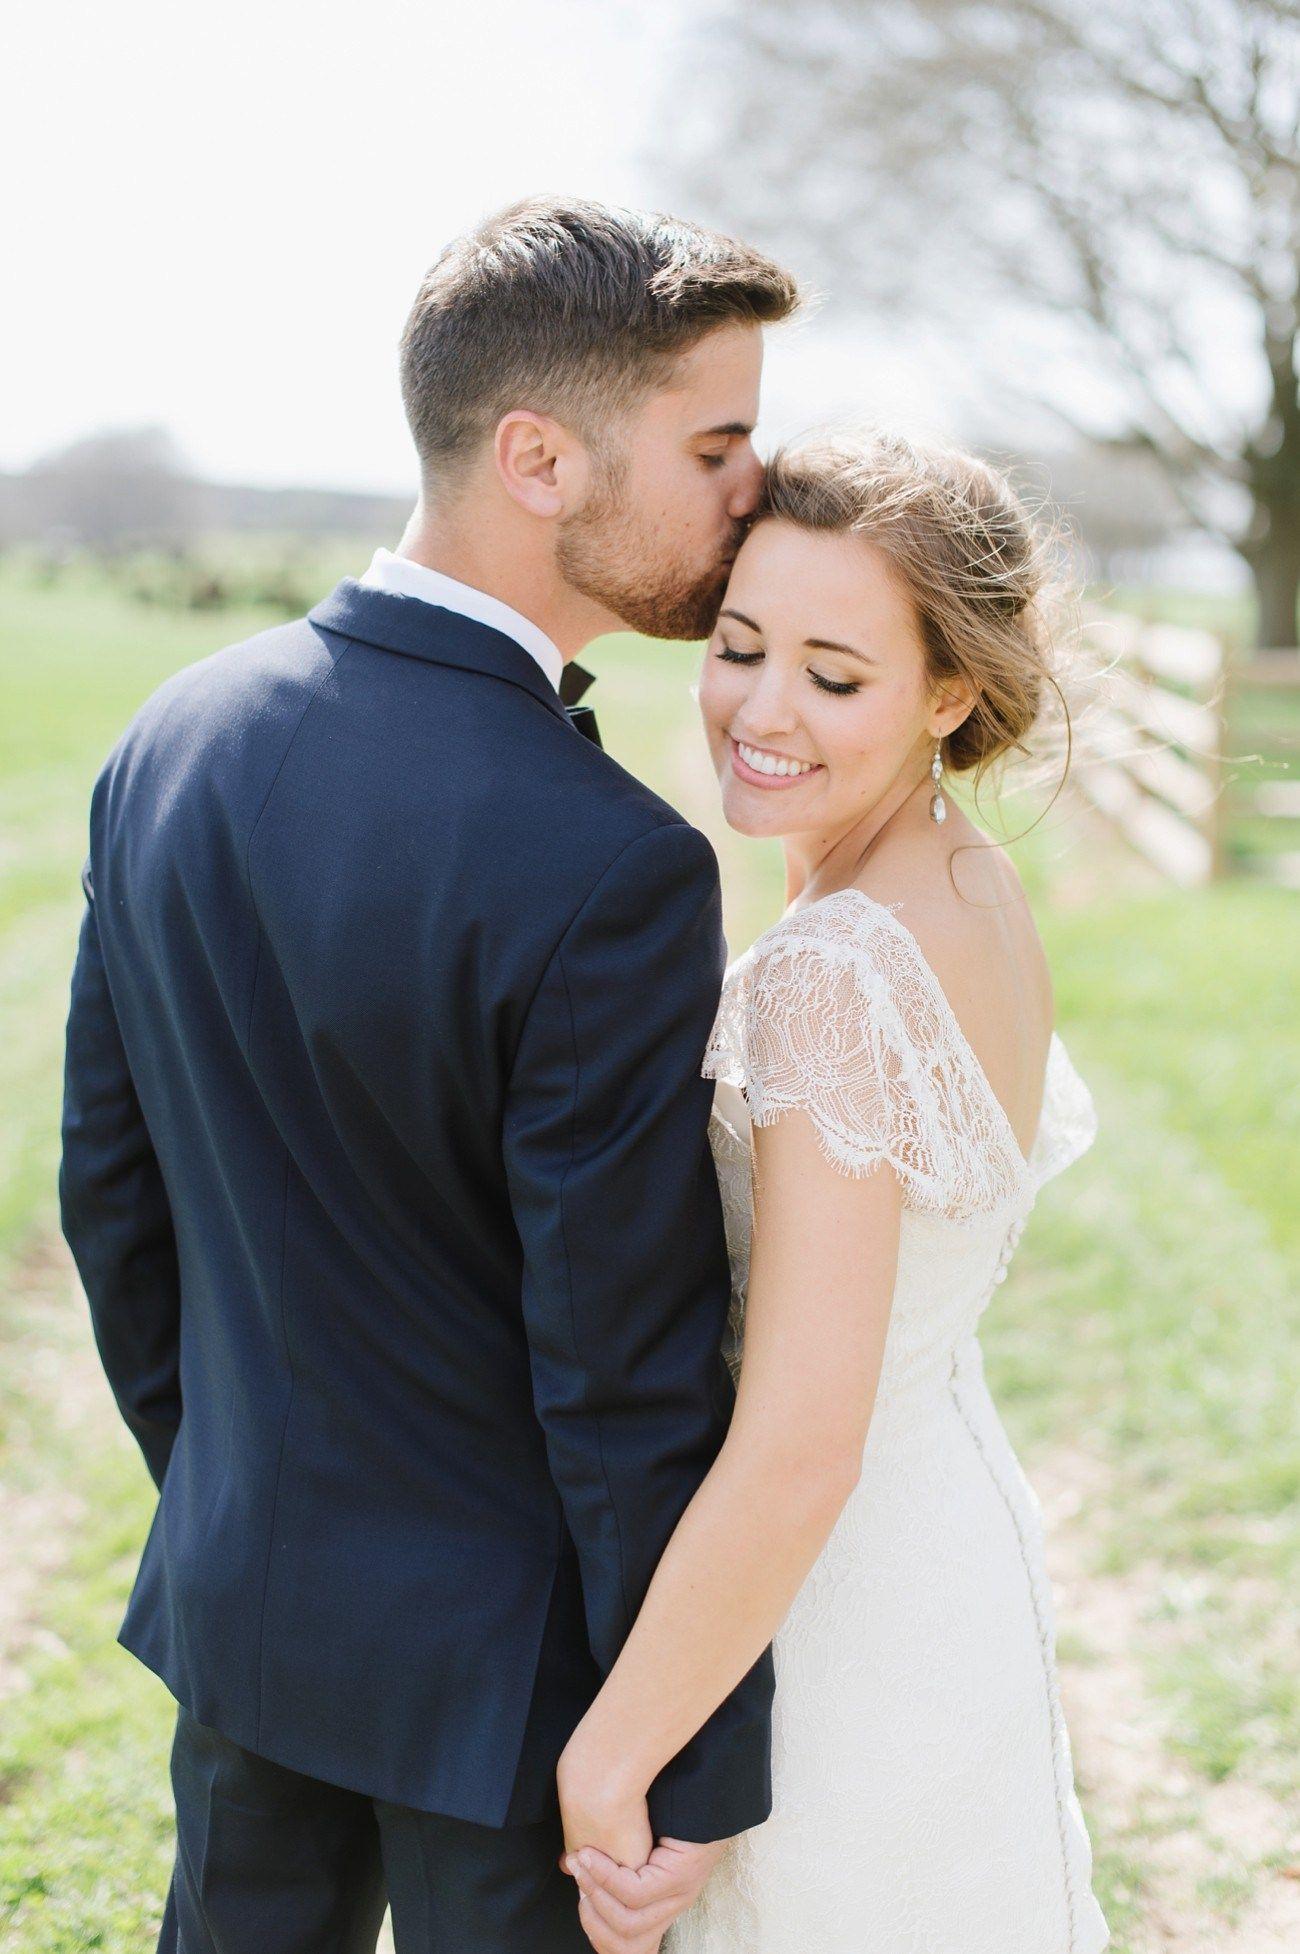 Outdoor Wedding Photography Ideas 82 Weddingphotography Wedding Photography Bride Wedding Picture Poses Wedding Couple Poses